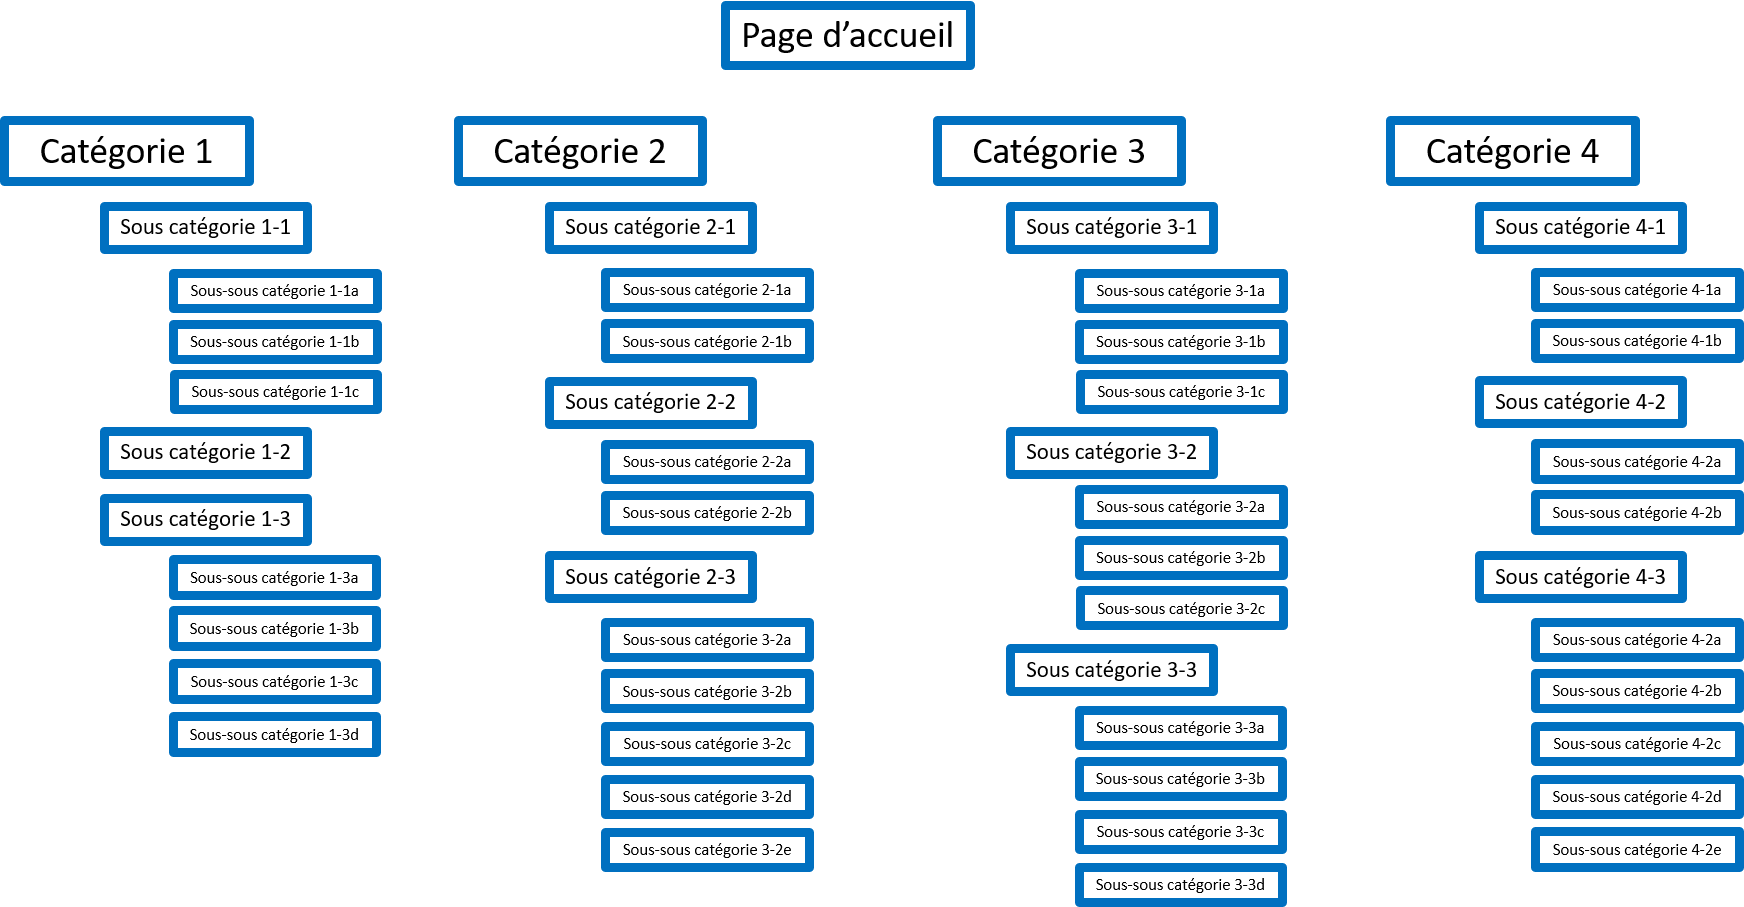 Arborescence menu semantique